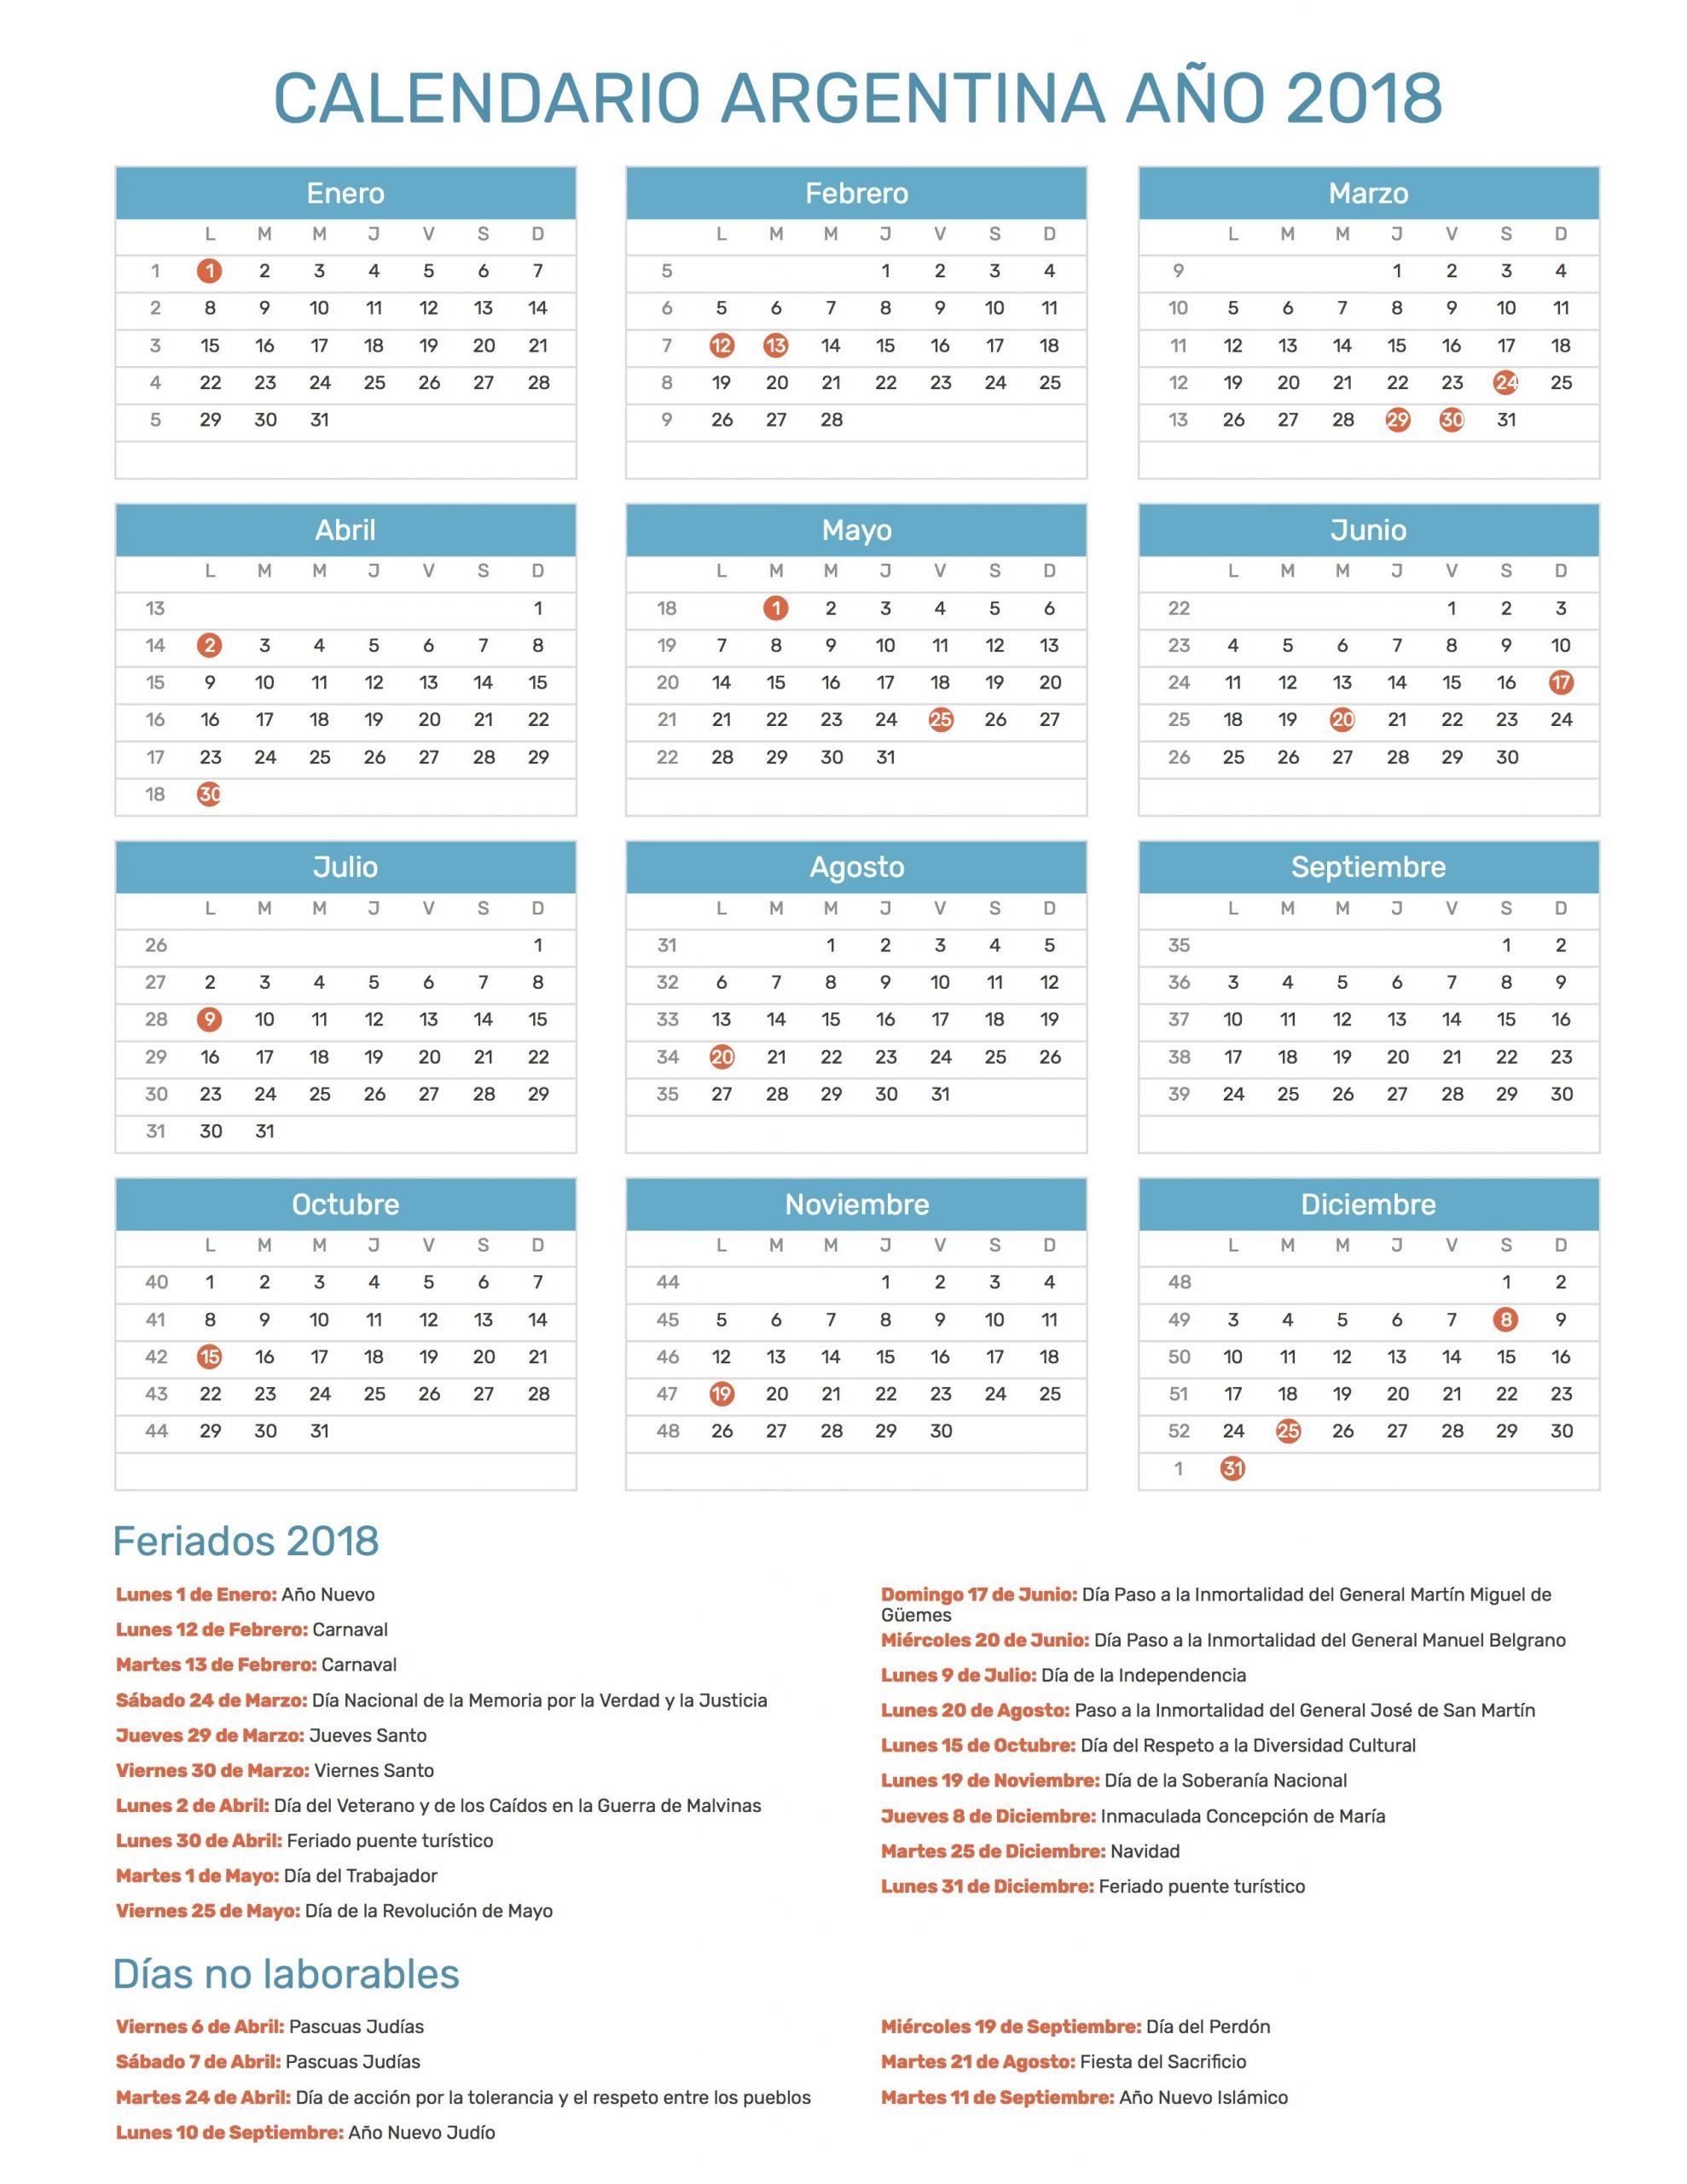 Calendario 2020 Bolivia Con Feriados Para Imprimir Actual Almanaque 2015 Argentina Para Imprimir Con Feriados New Of Calendario 2020 Bolivia Con Feriados Para Imprimir Más Recientemente Liberado Calendario Septiembre 2015 Para Imprimir Corto